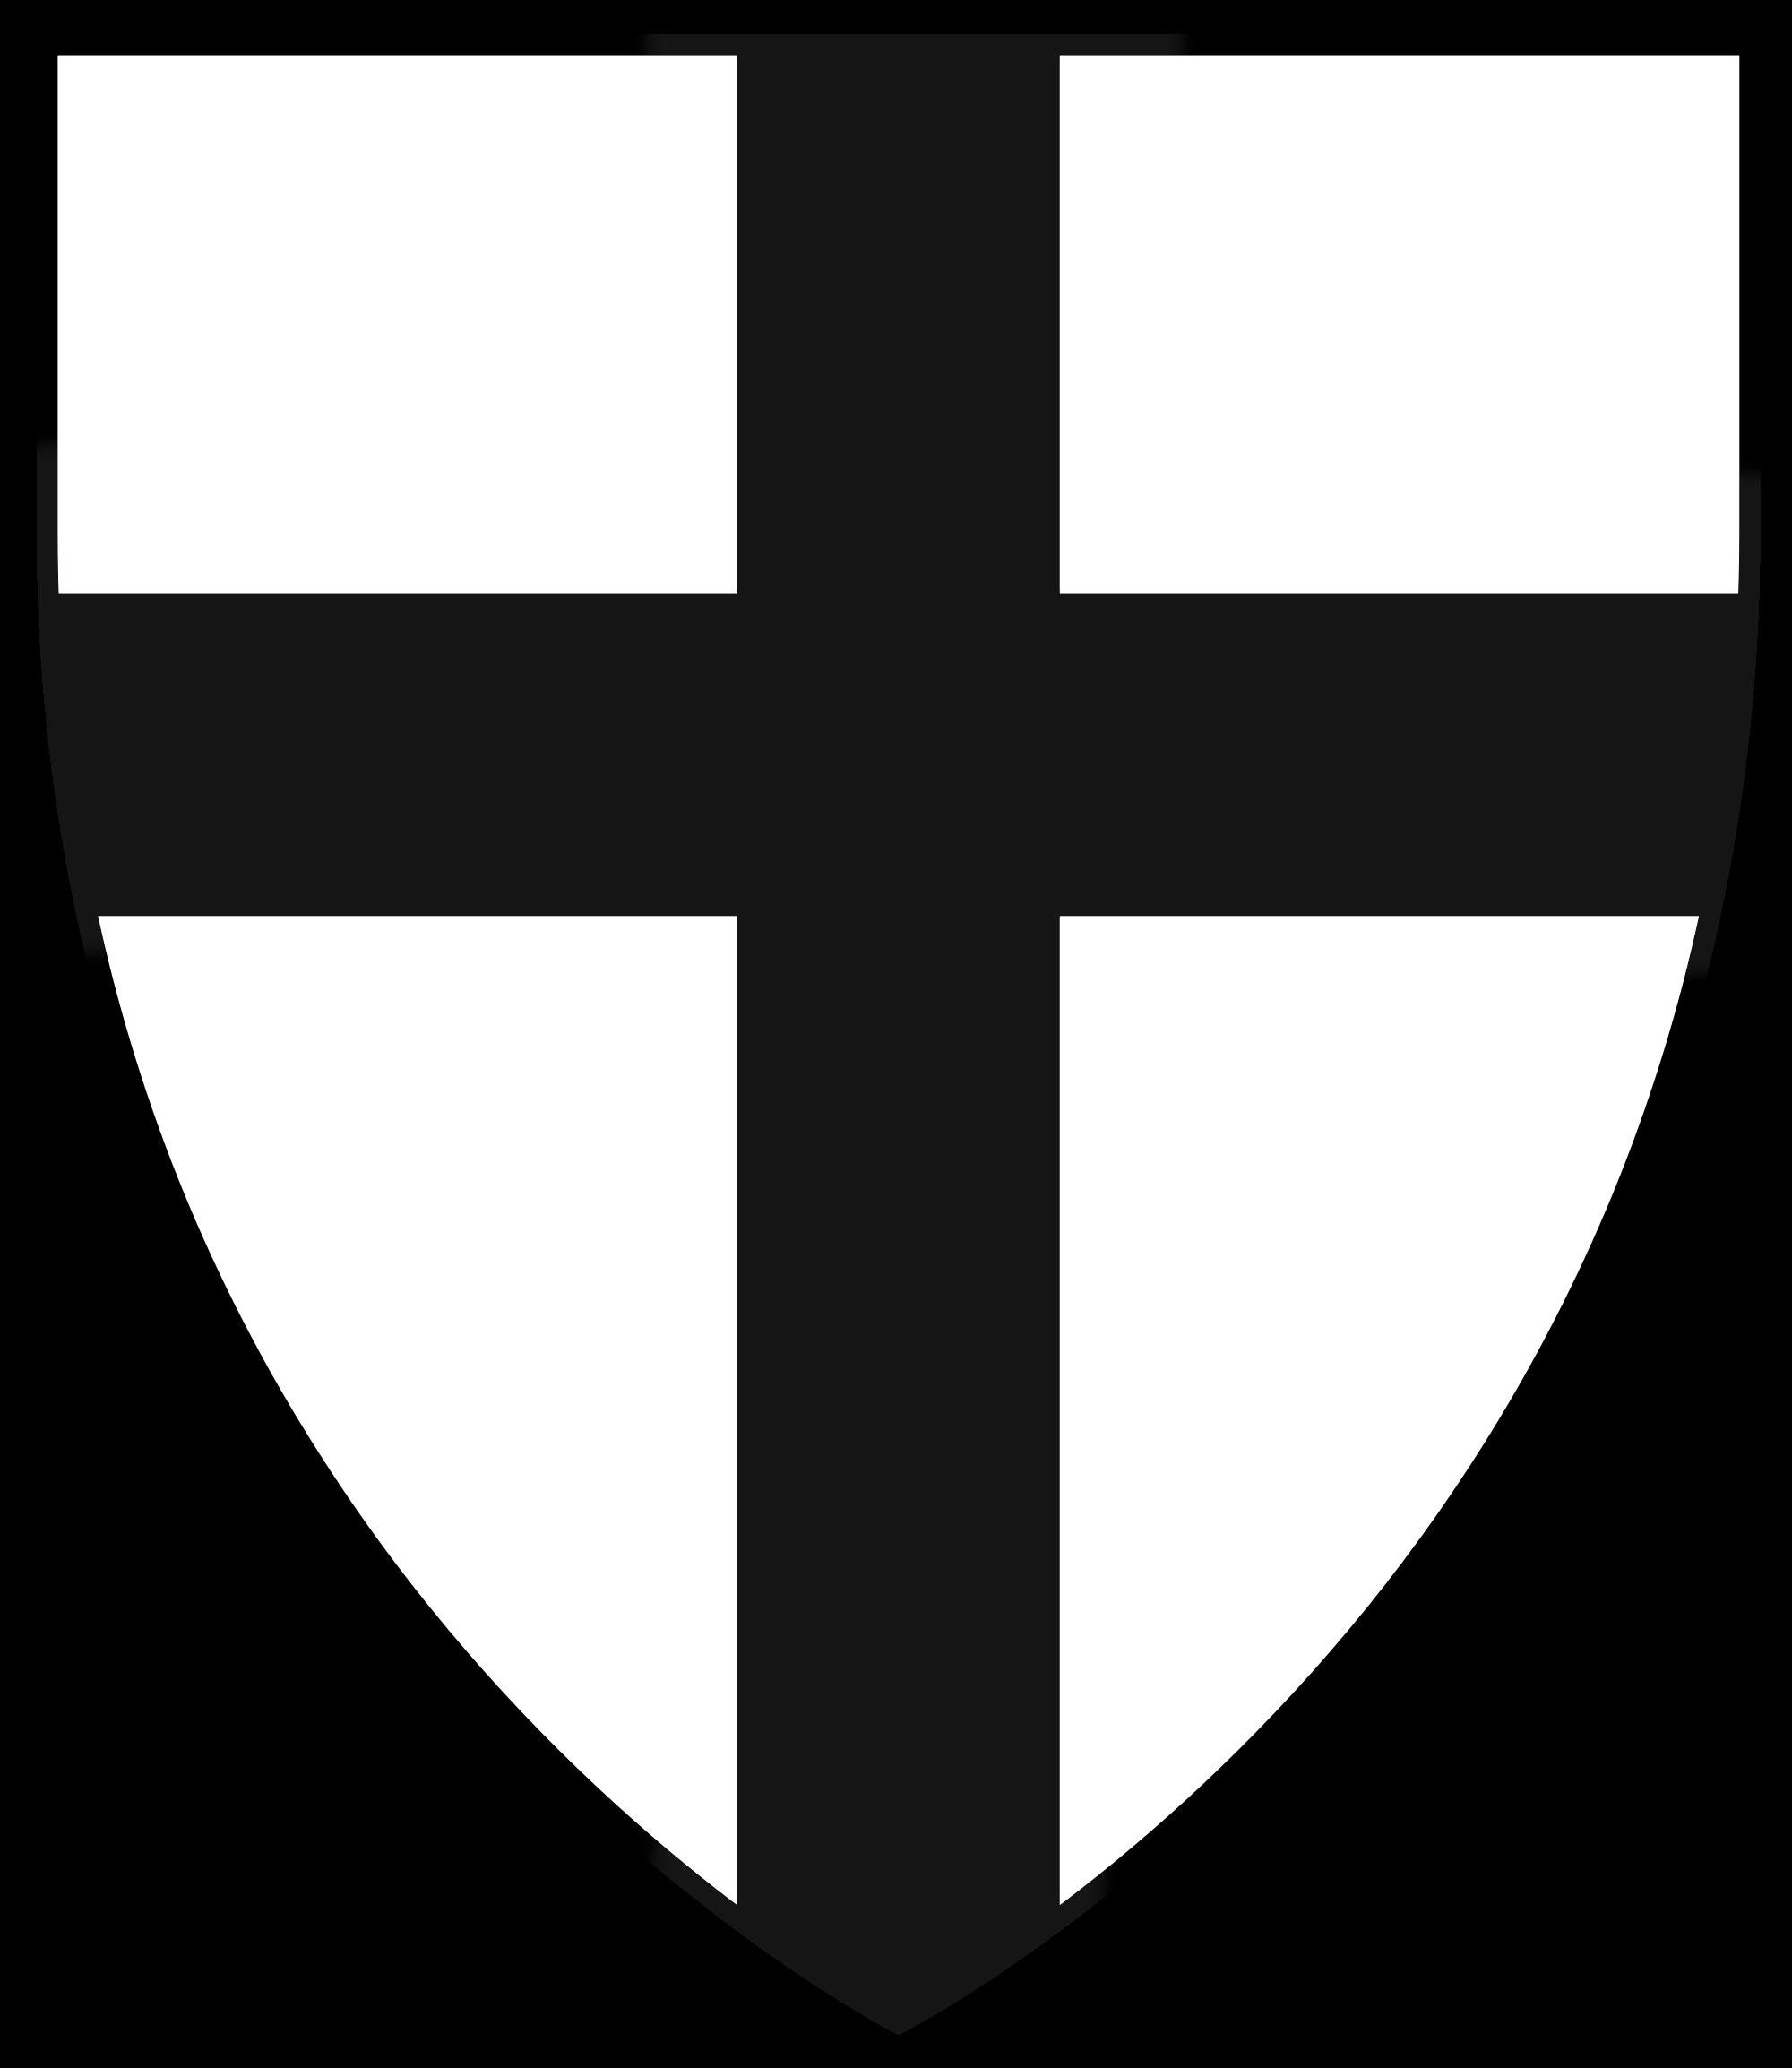 Teutonic_Order_heraldry.png